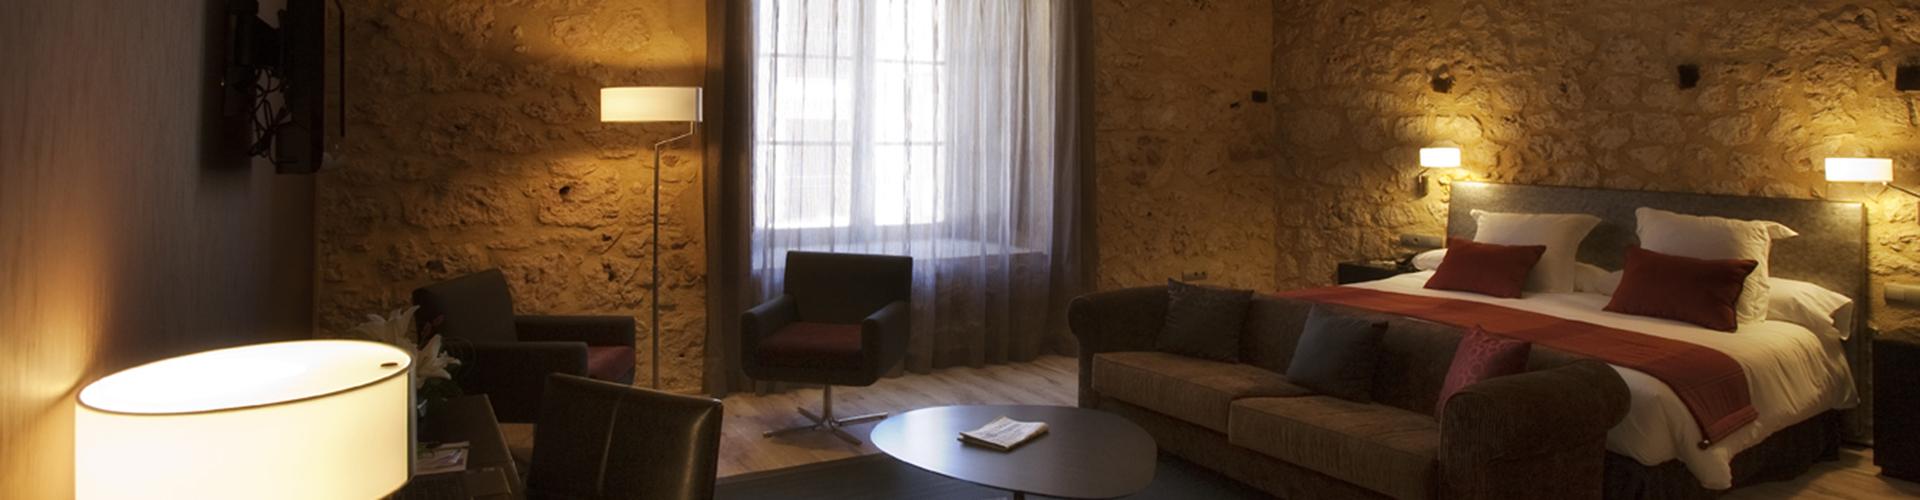 HOTEL TERMAL BURGO DE OSMA (2)